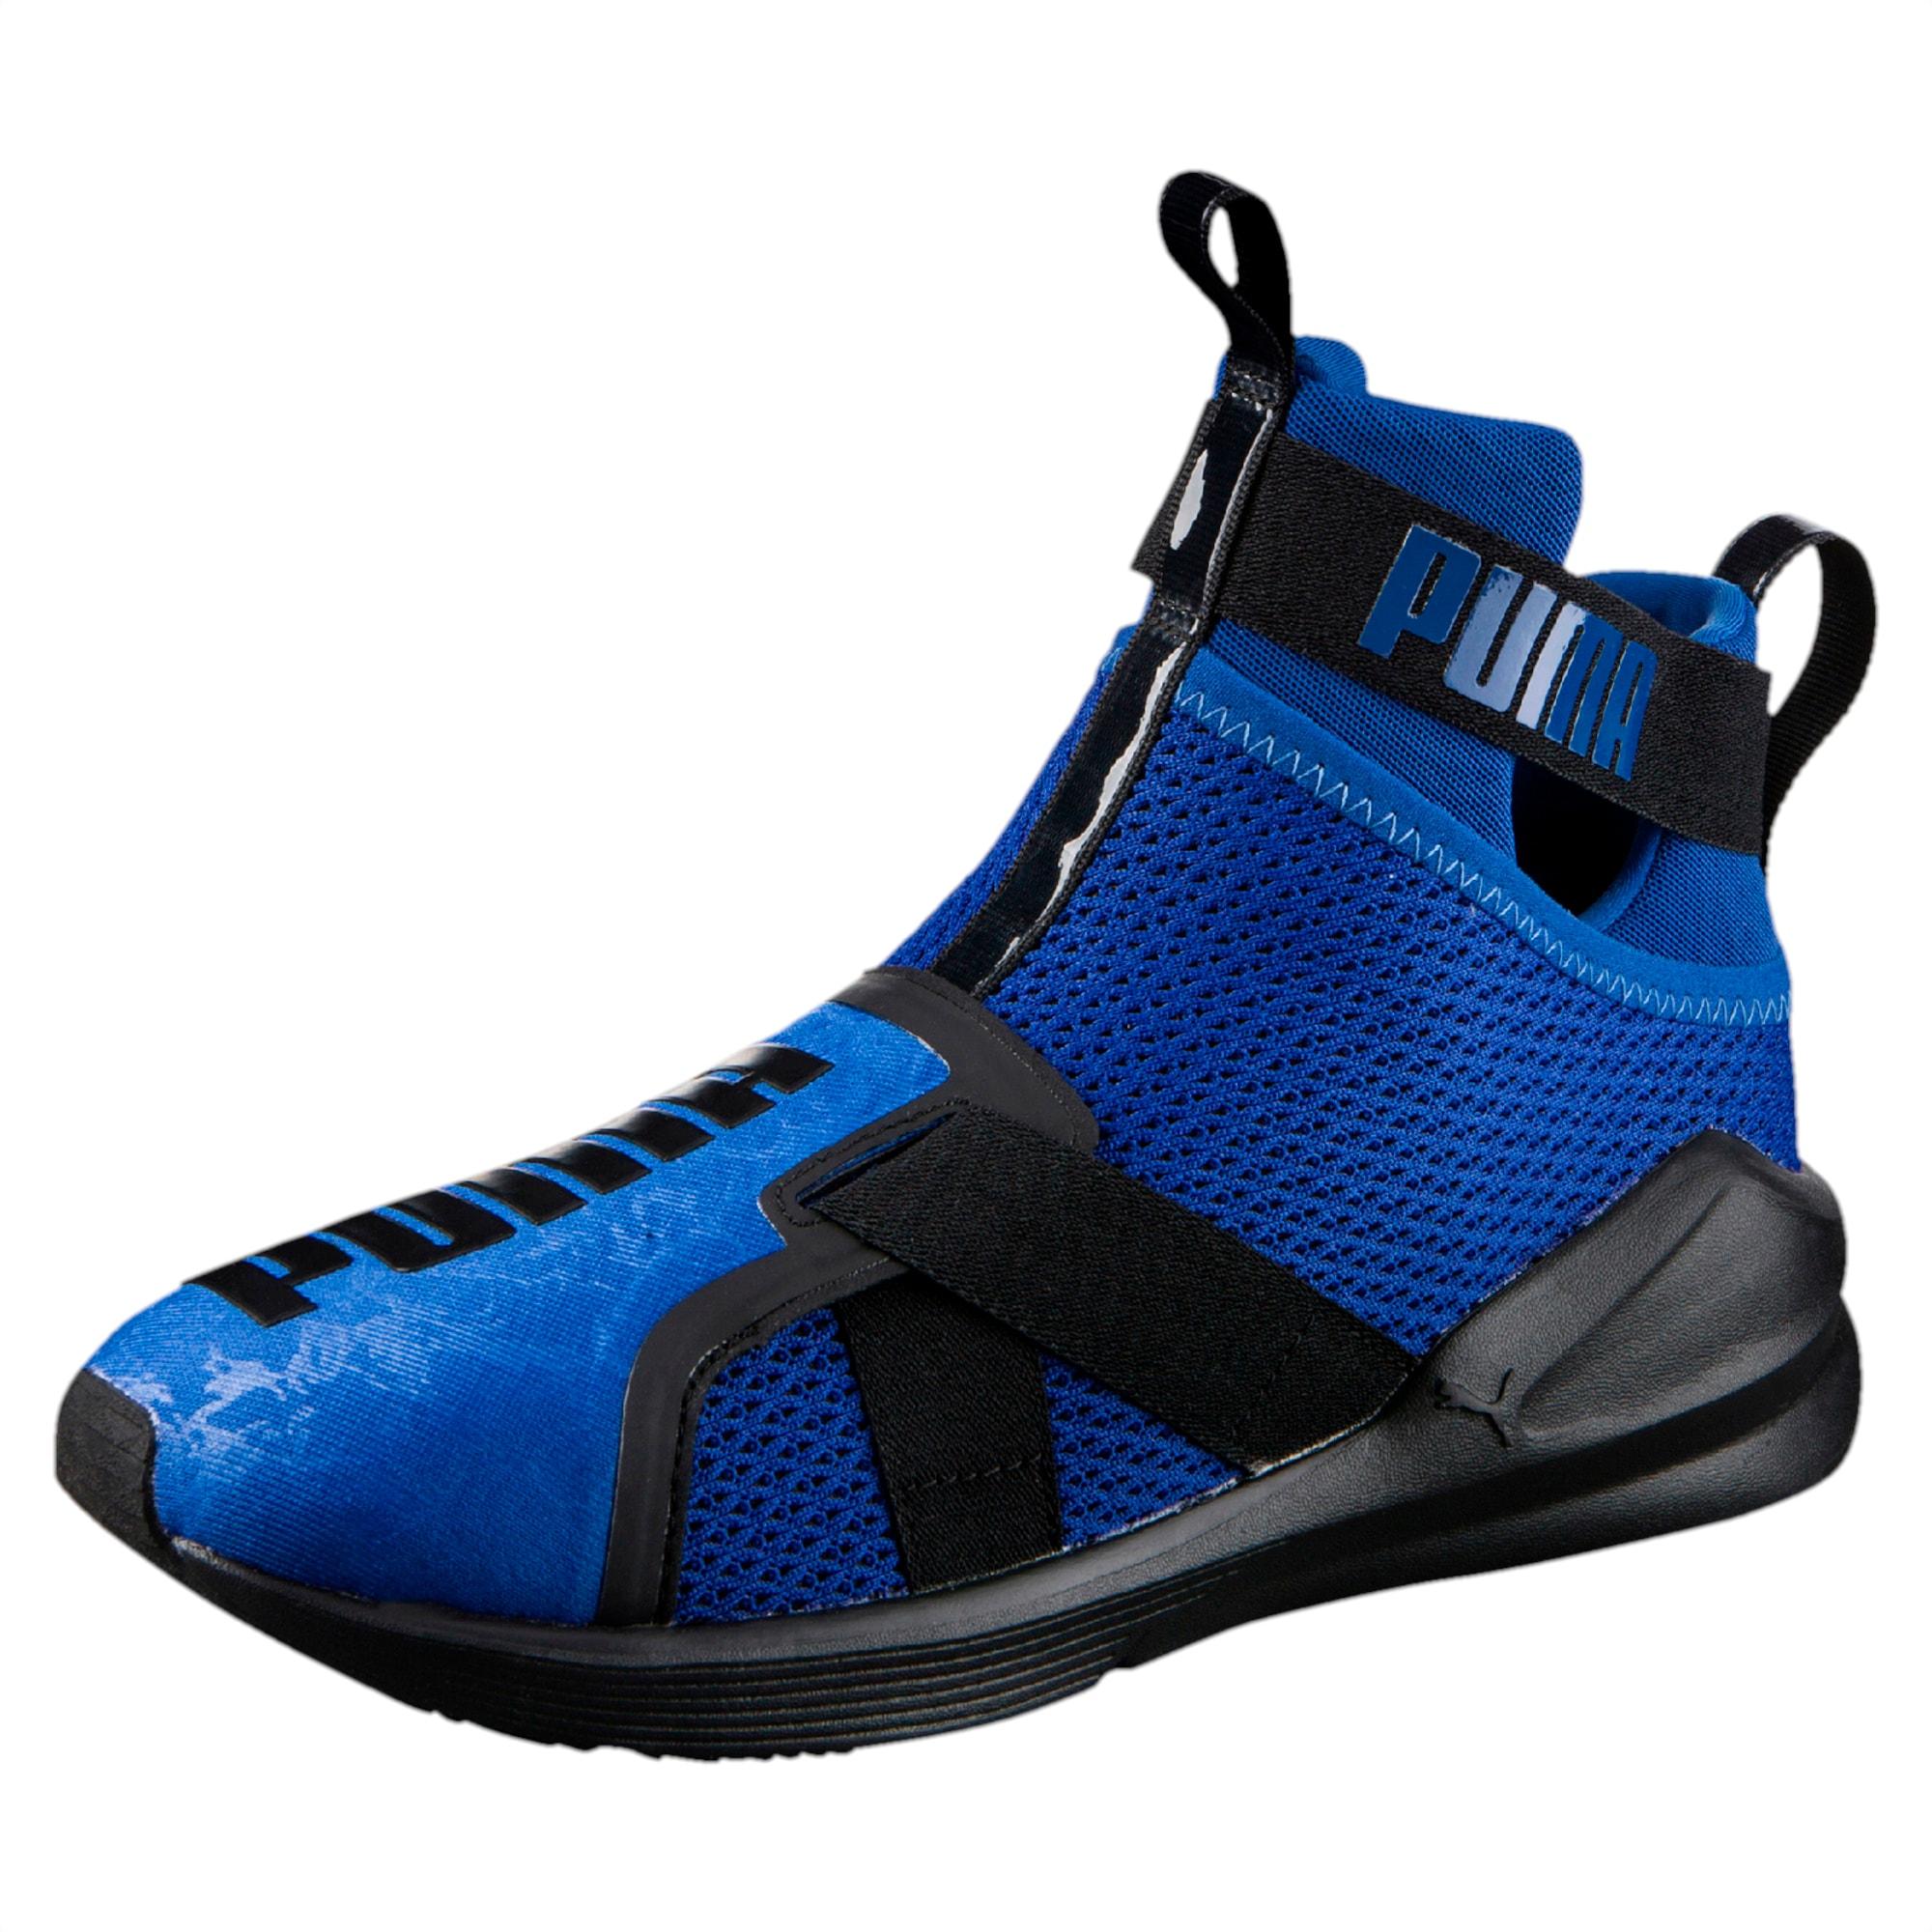 puma fierce shine trainer sneaker - black